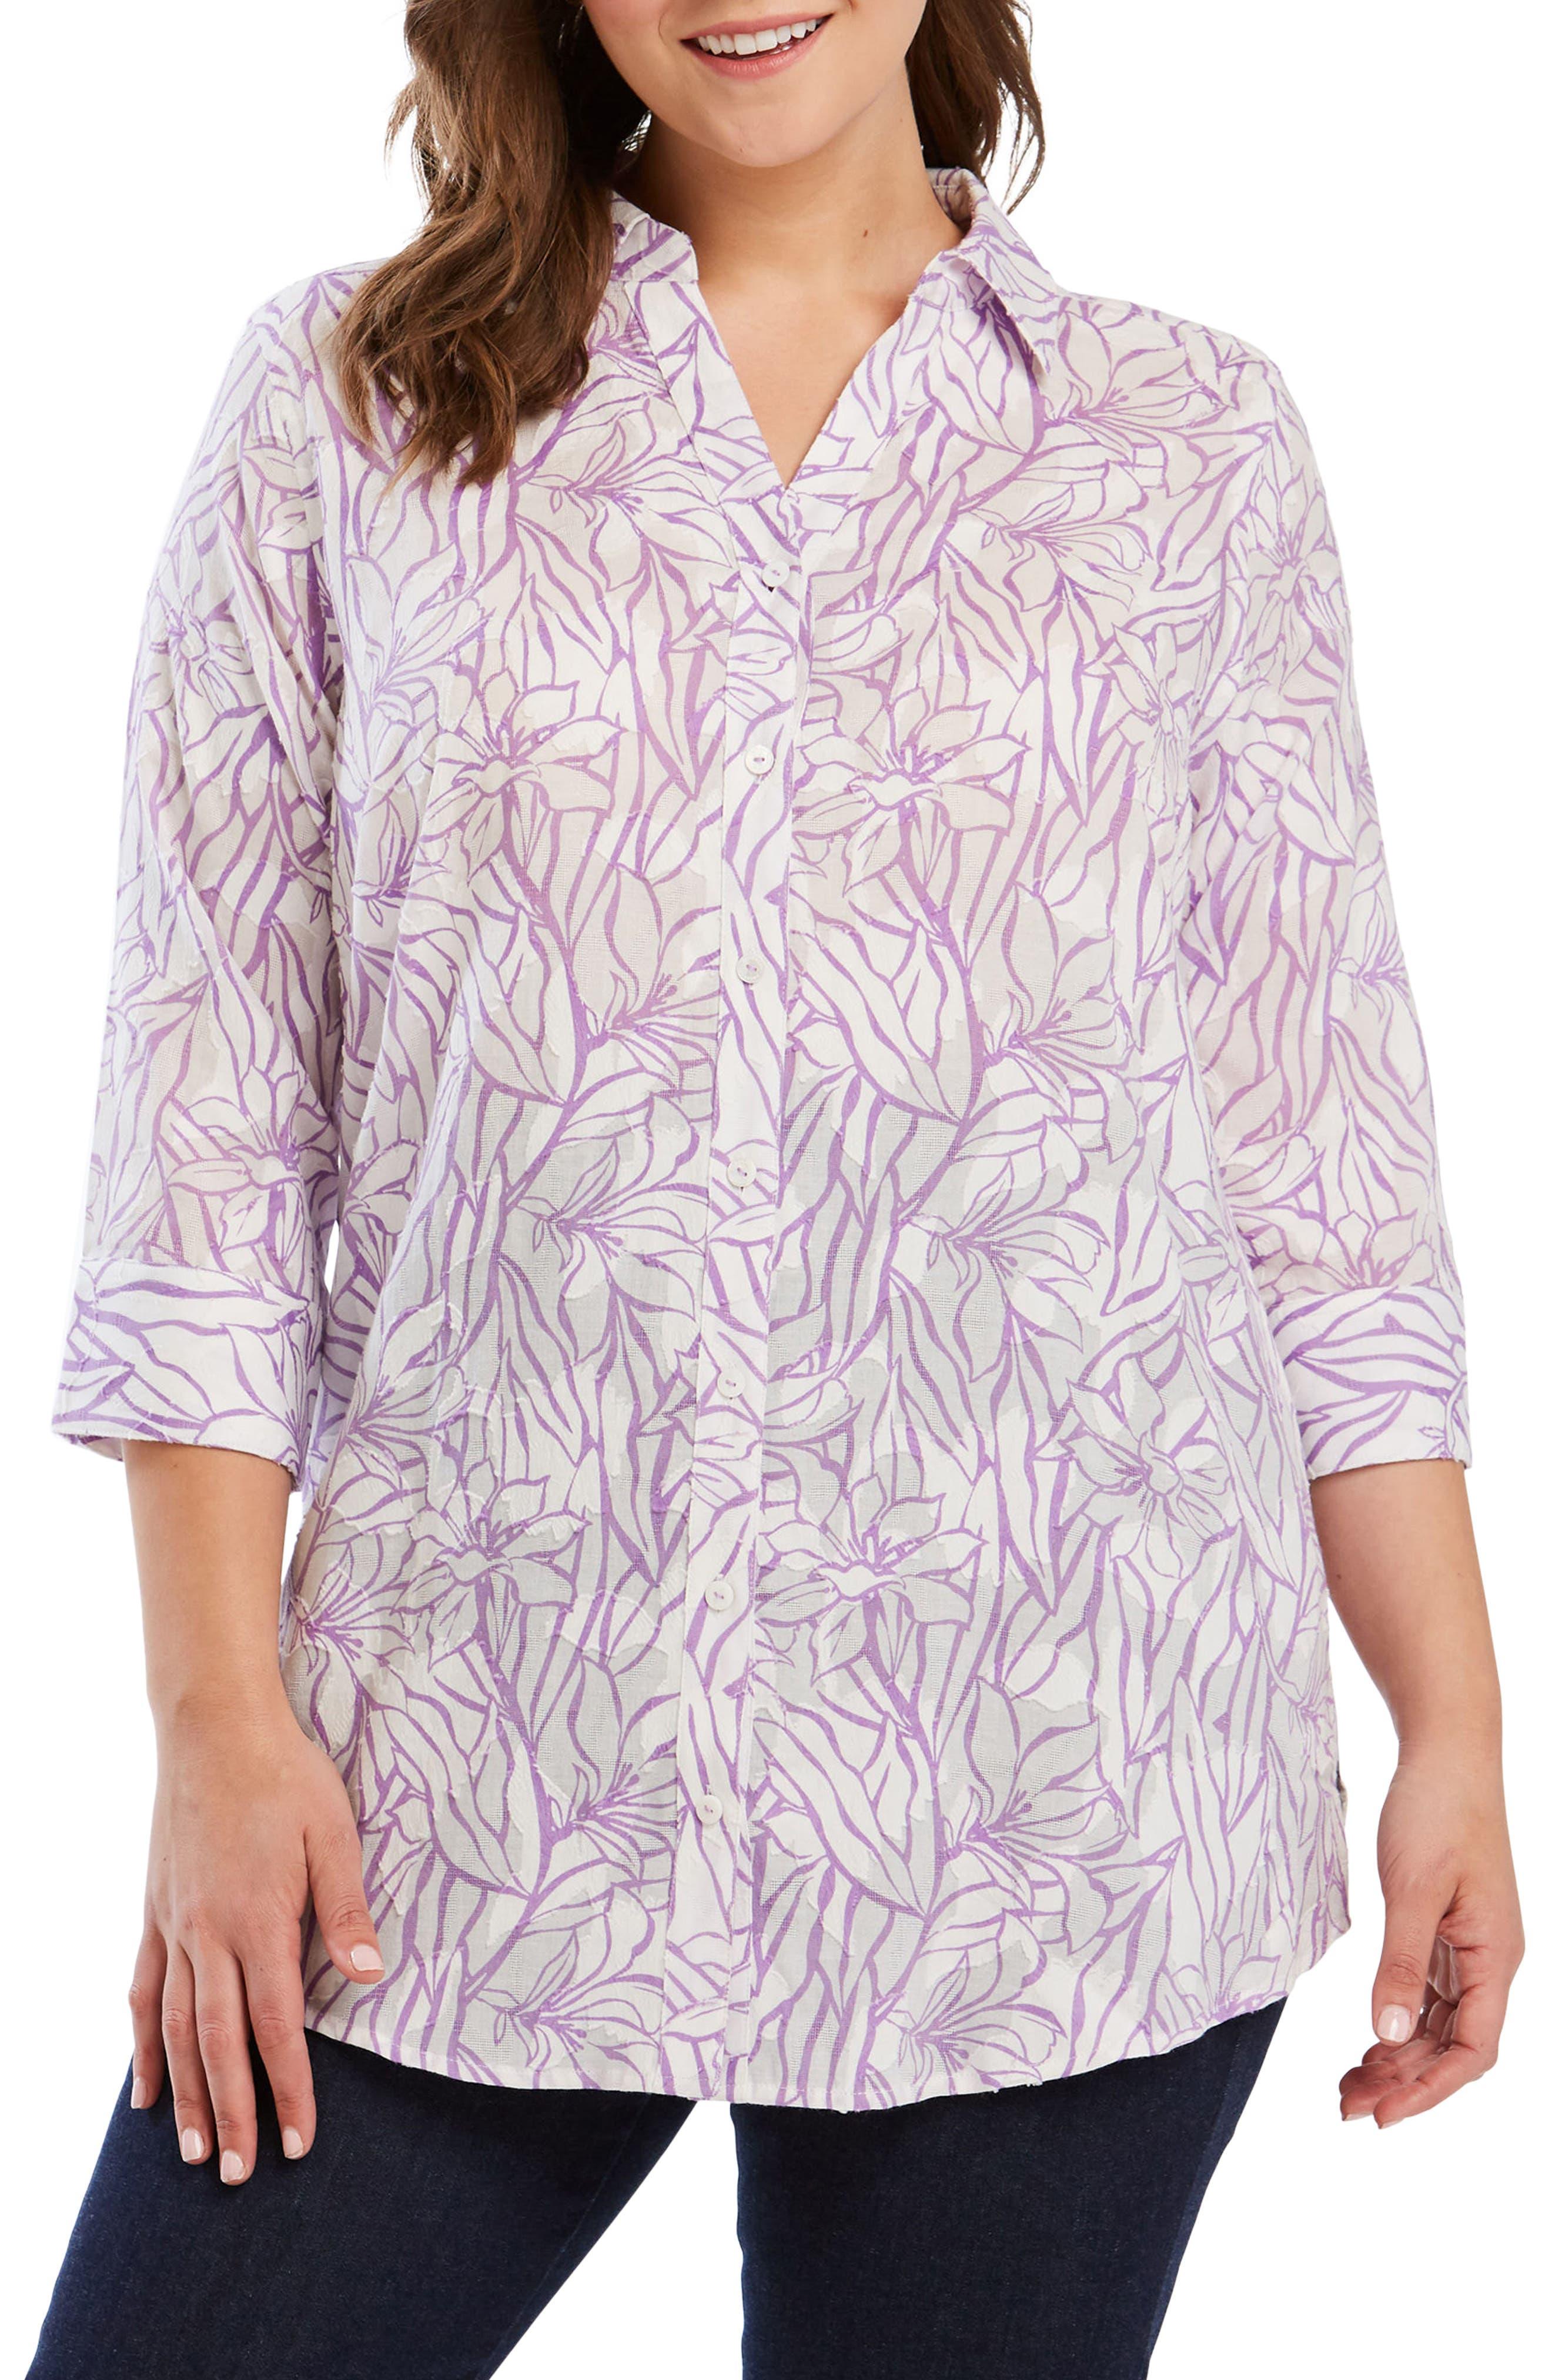 Faith Floral Jacquard Shirt,                             Main thumbnail 1, color,                             530